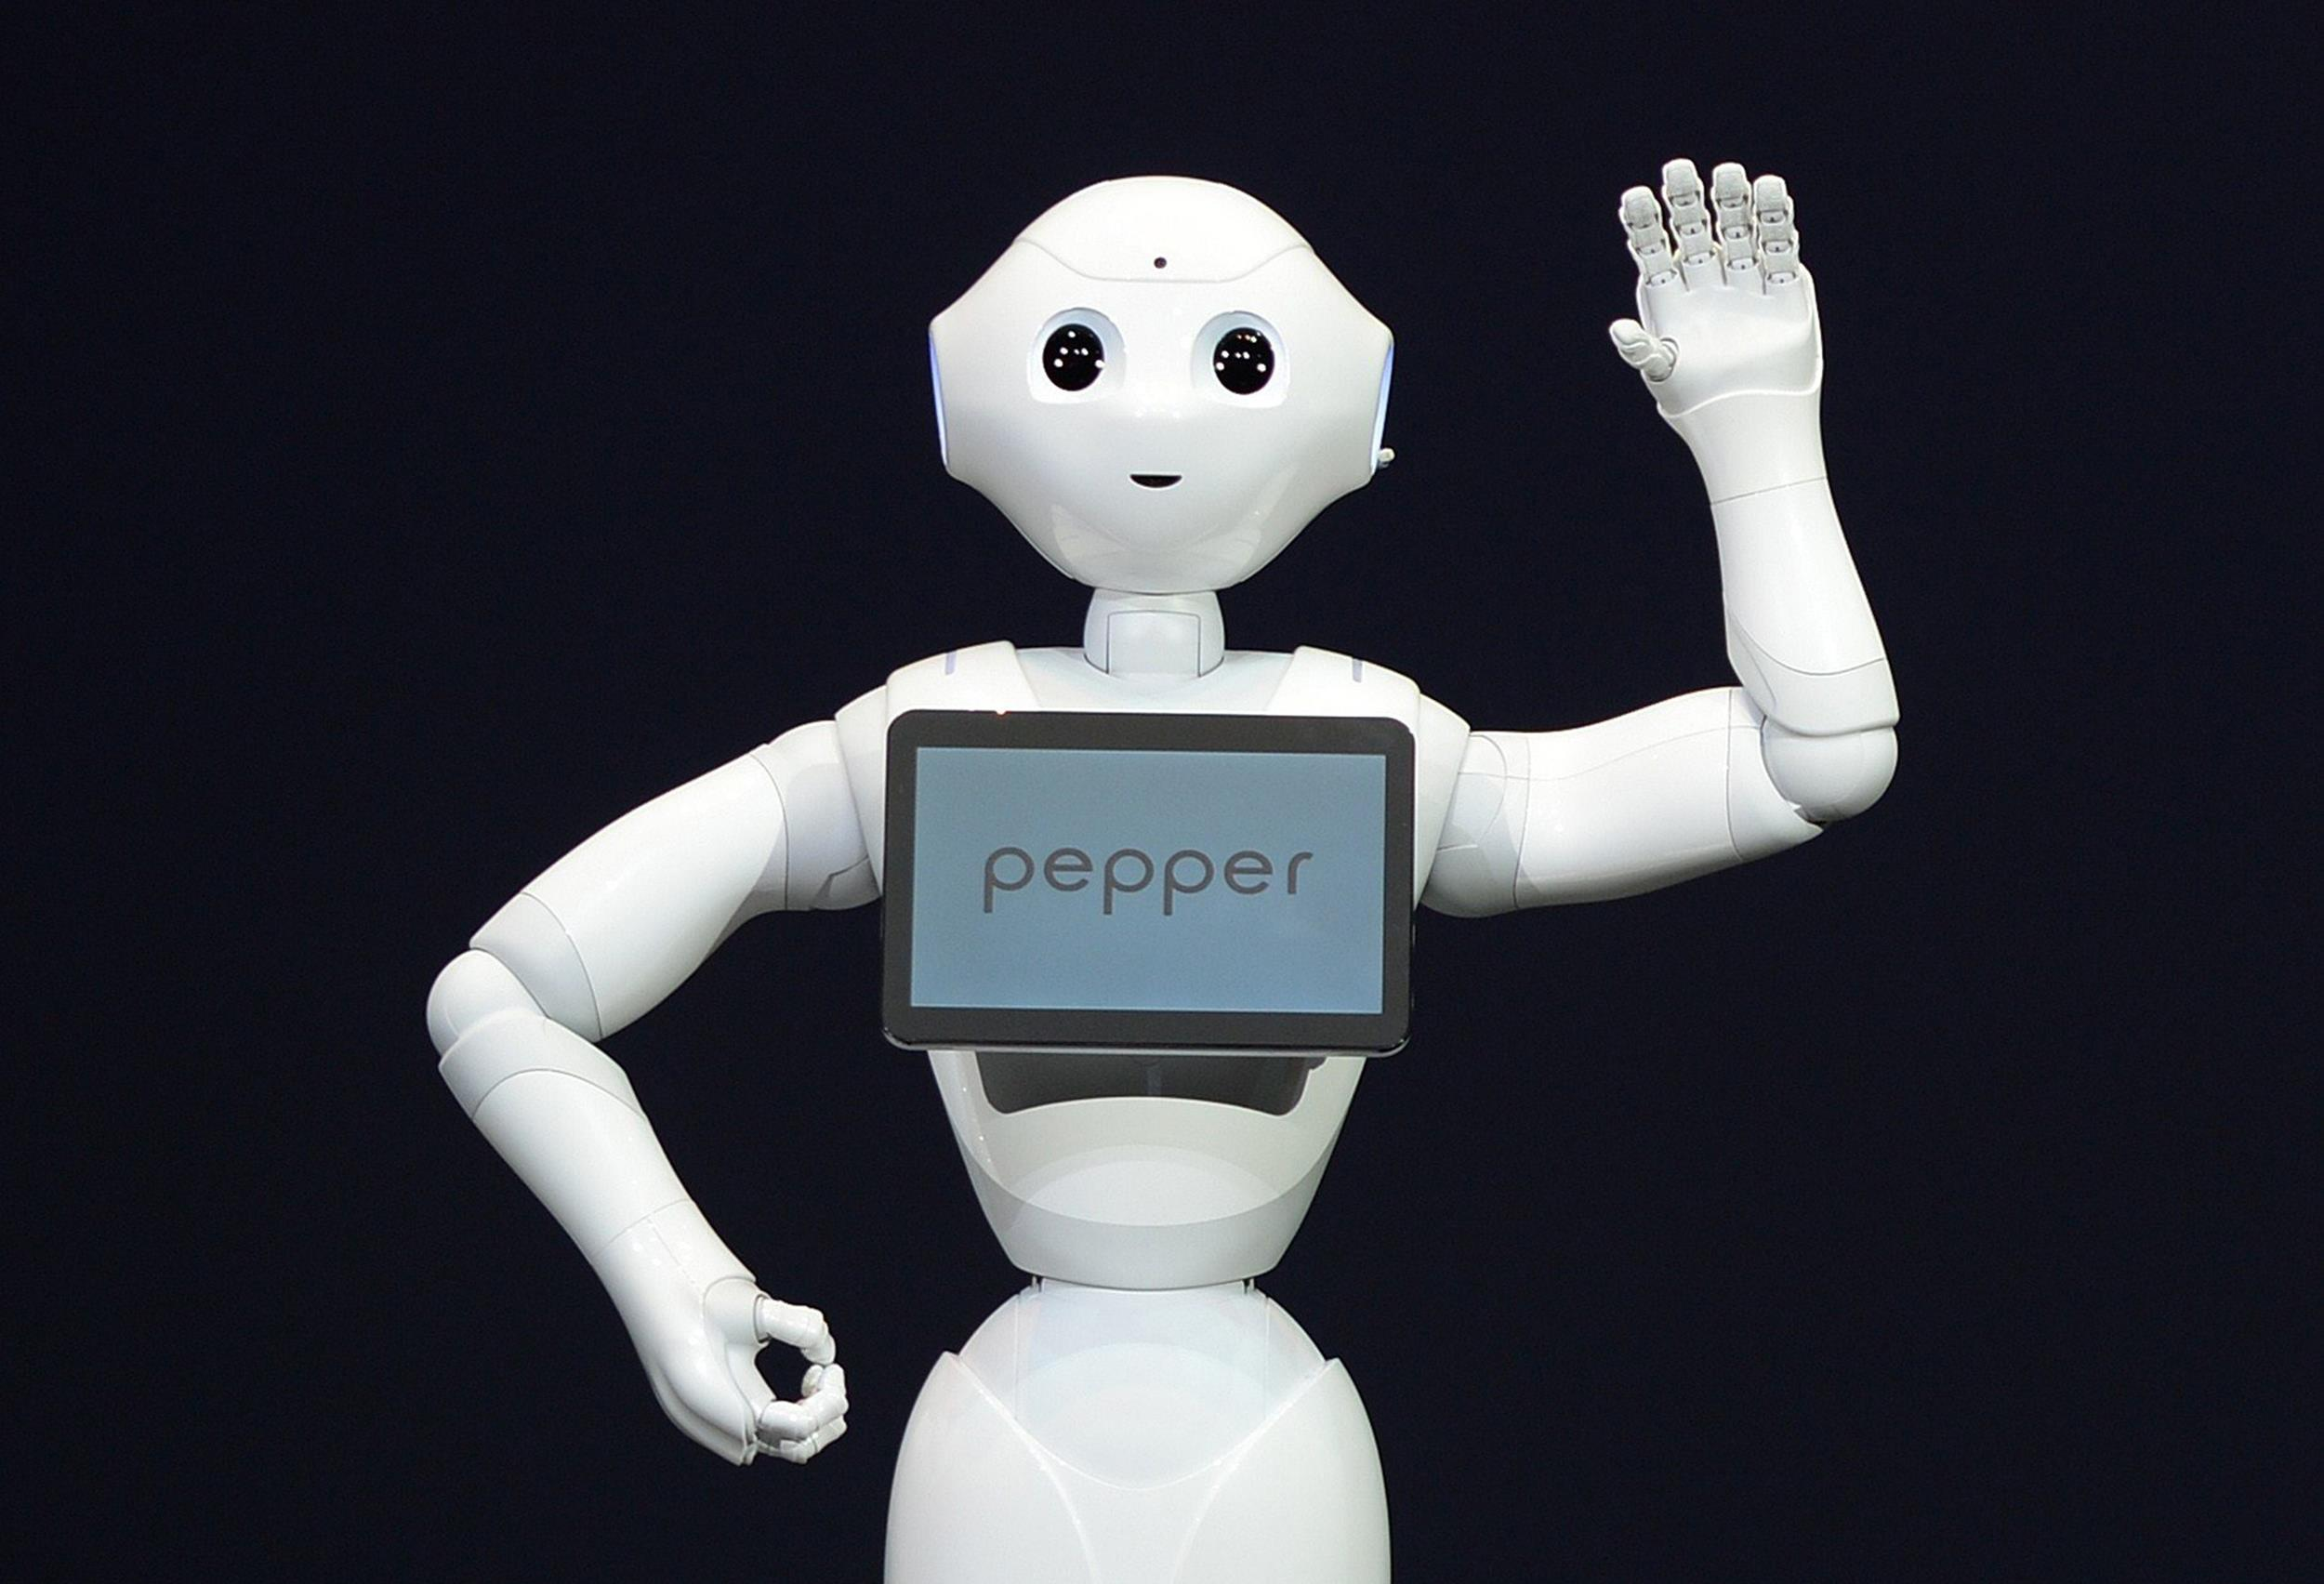 140605-humanoid-jms-1257_f909e2e1f8752551b981b92a45cf9071